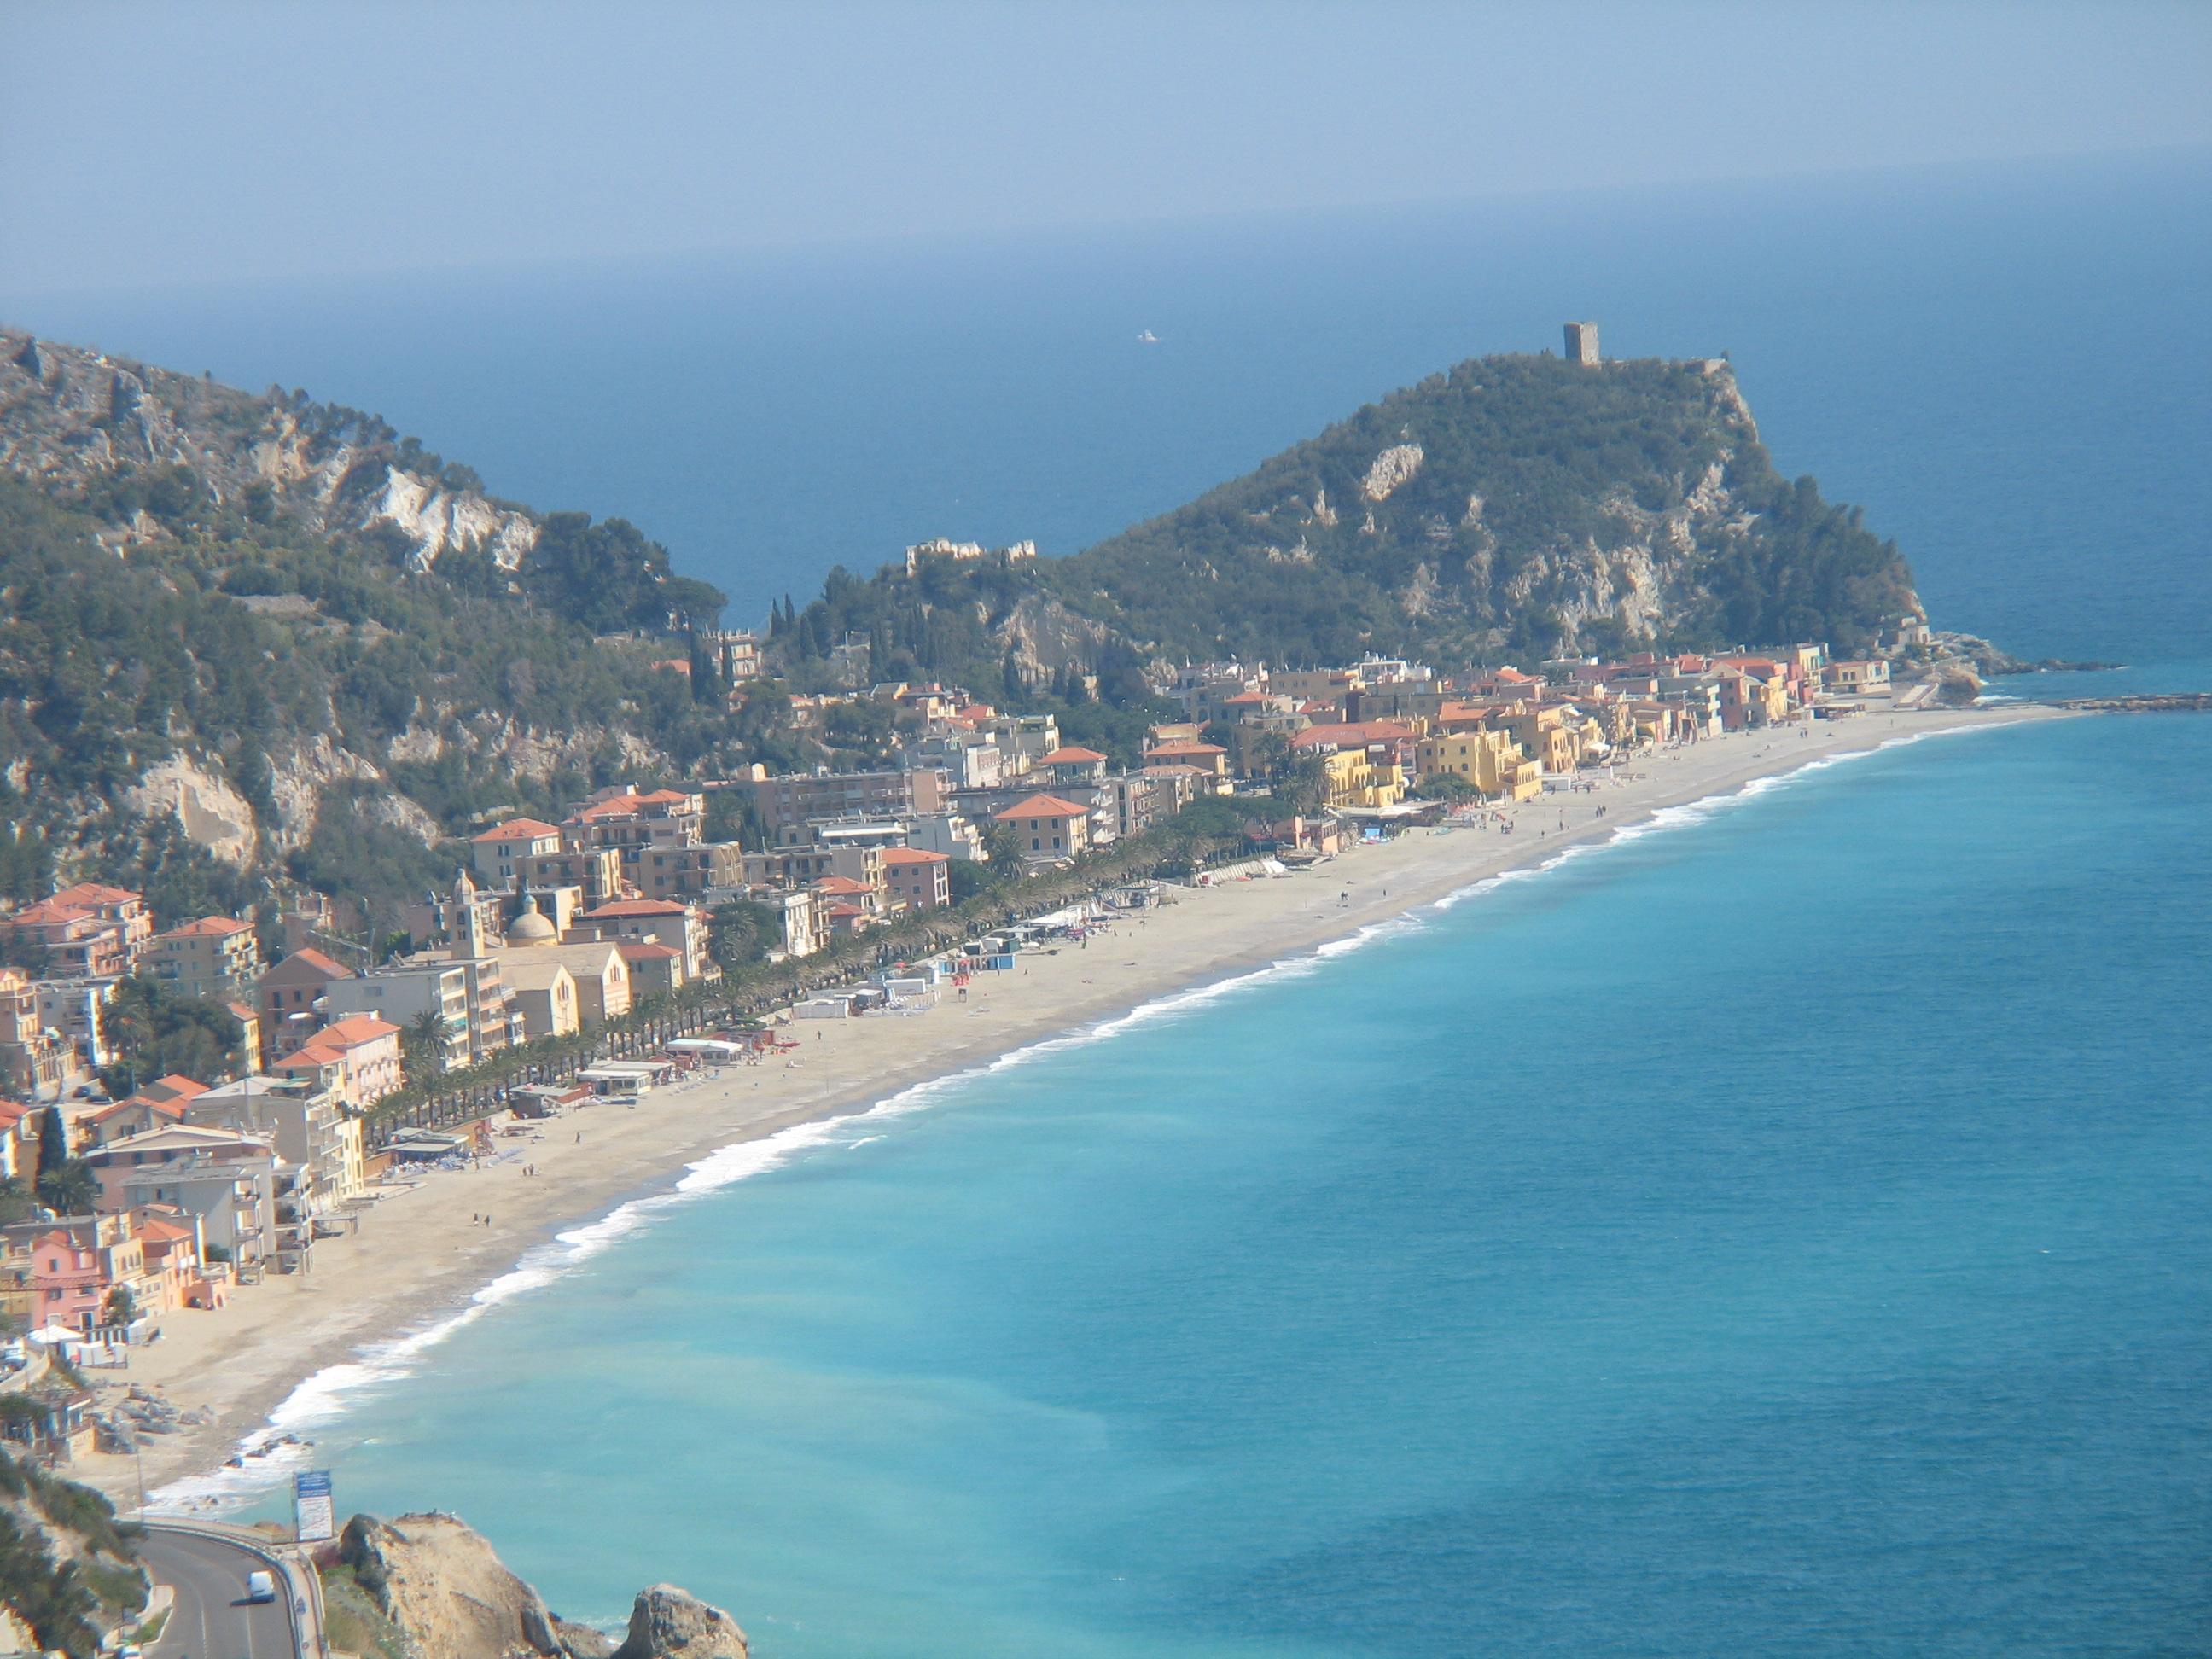 Matrimonio Spiaggia Varigotti : File varigotti panorama dalla torre caviglia g